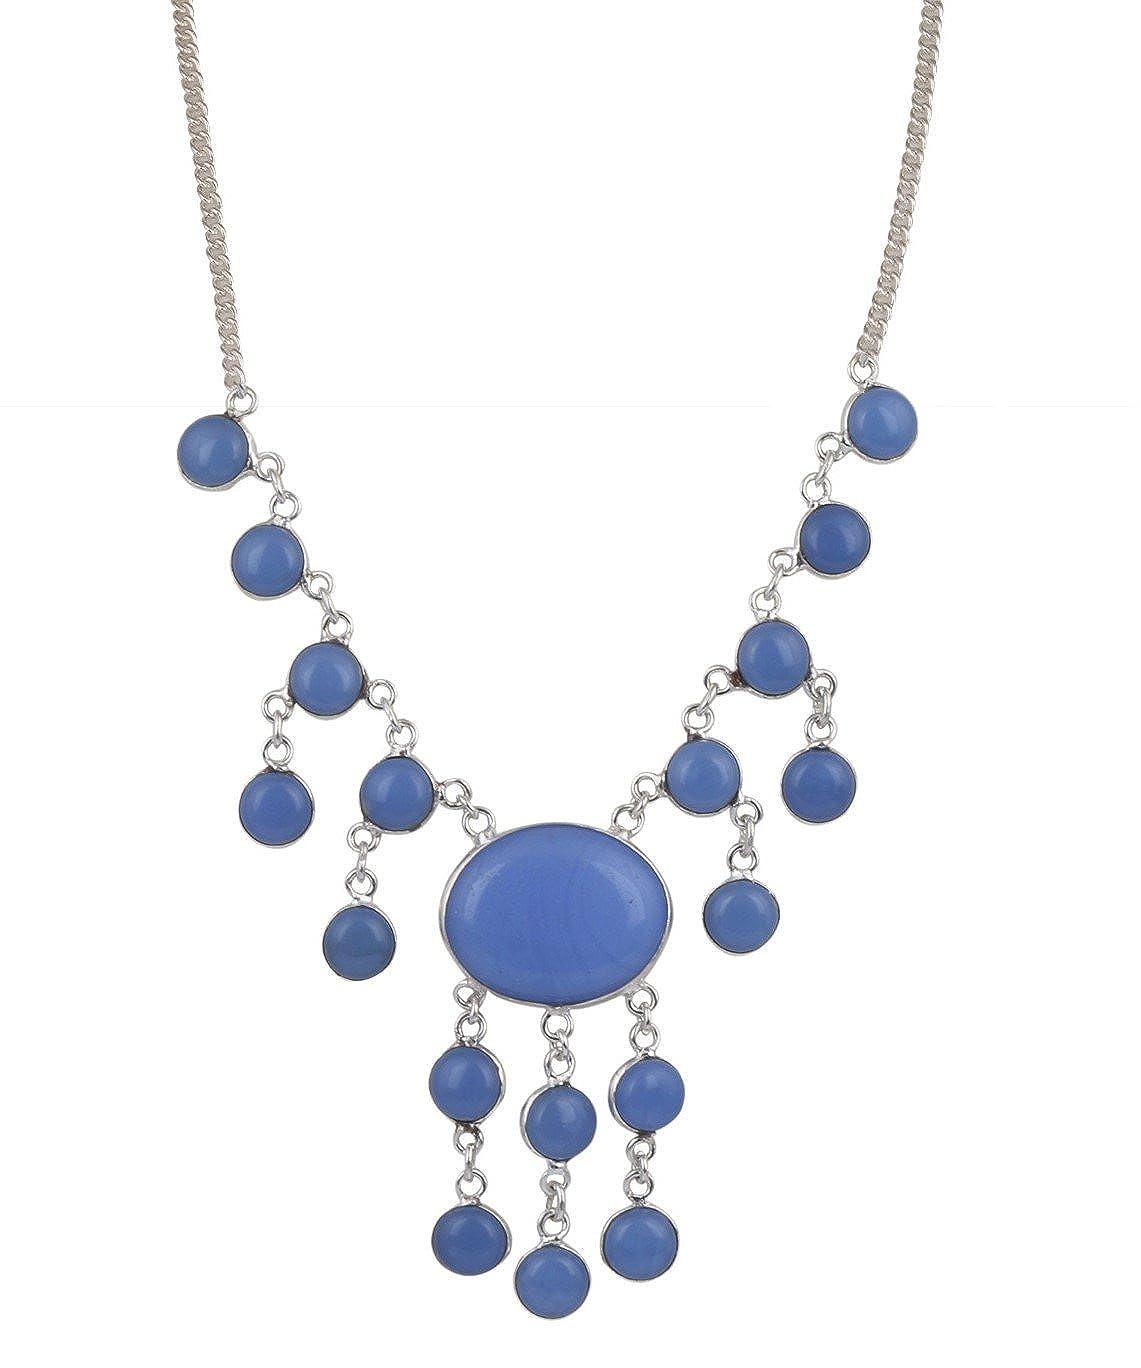 Sansar India Peacock Beads Golden Pendant Indian Necklace Jewelry Girls Women